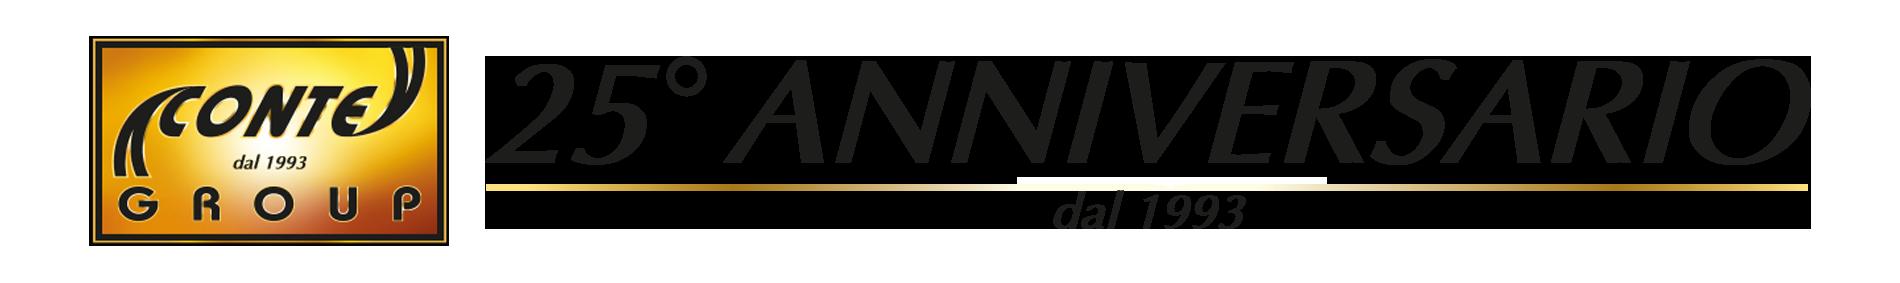 banner-25anni-definitivo